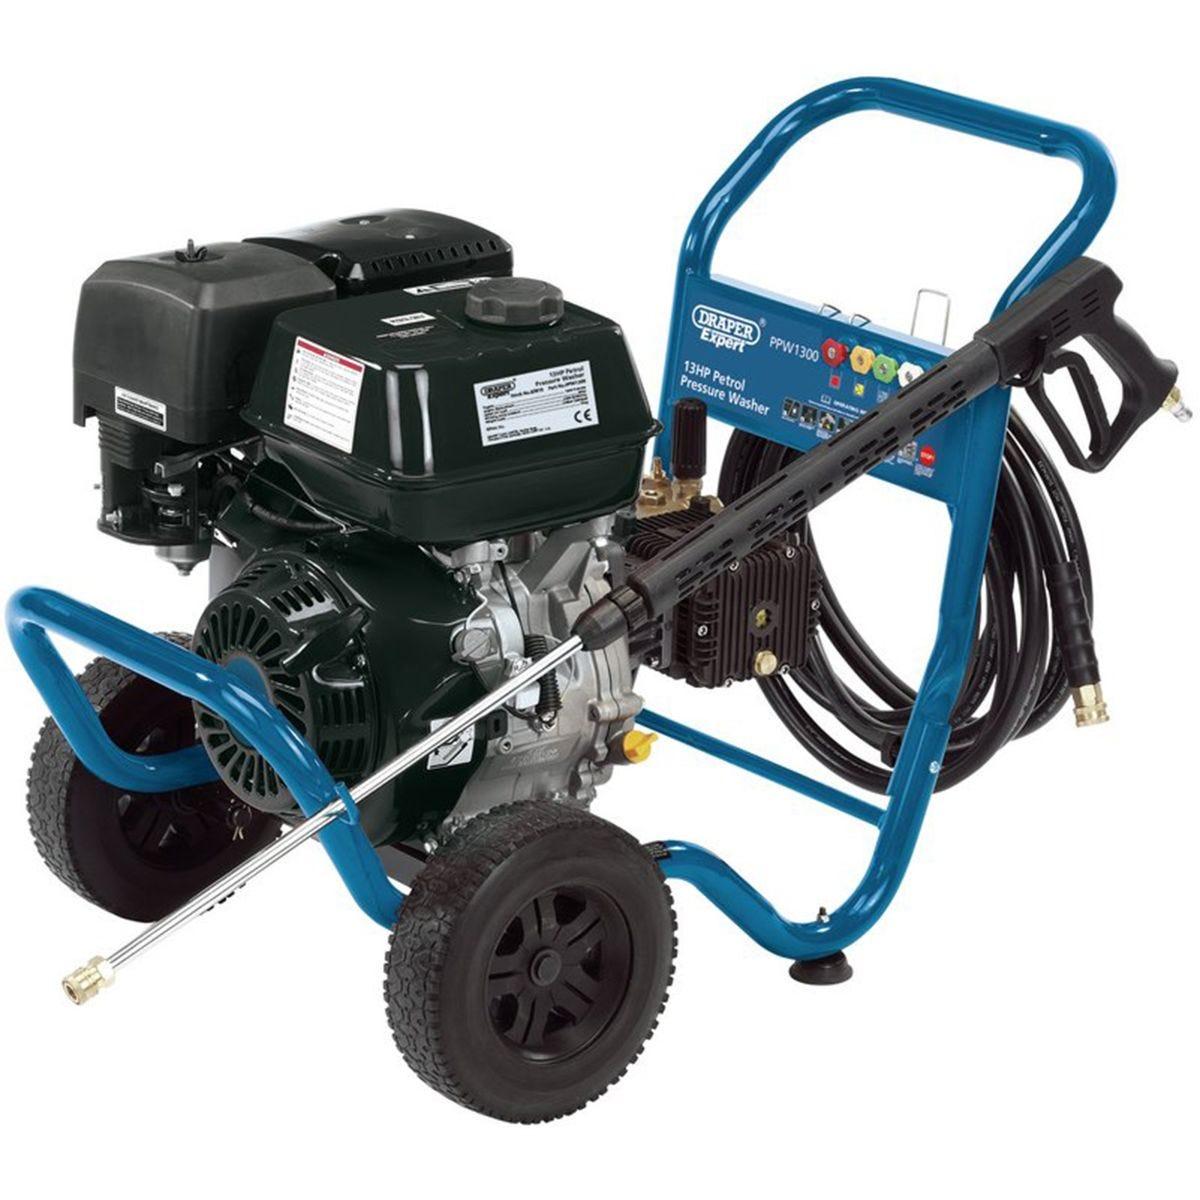 Draper Petrol Pressure Washer (13HP)